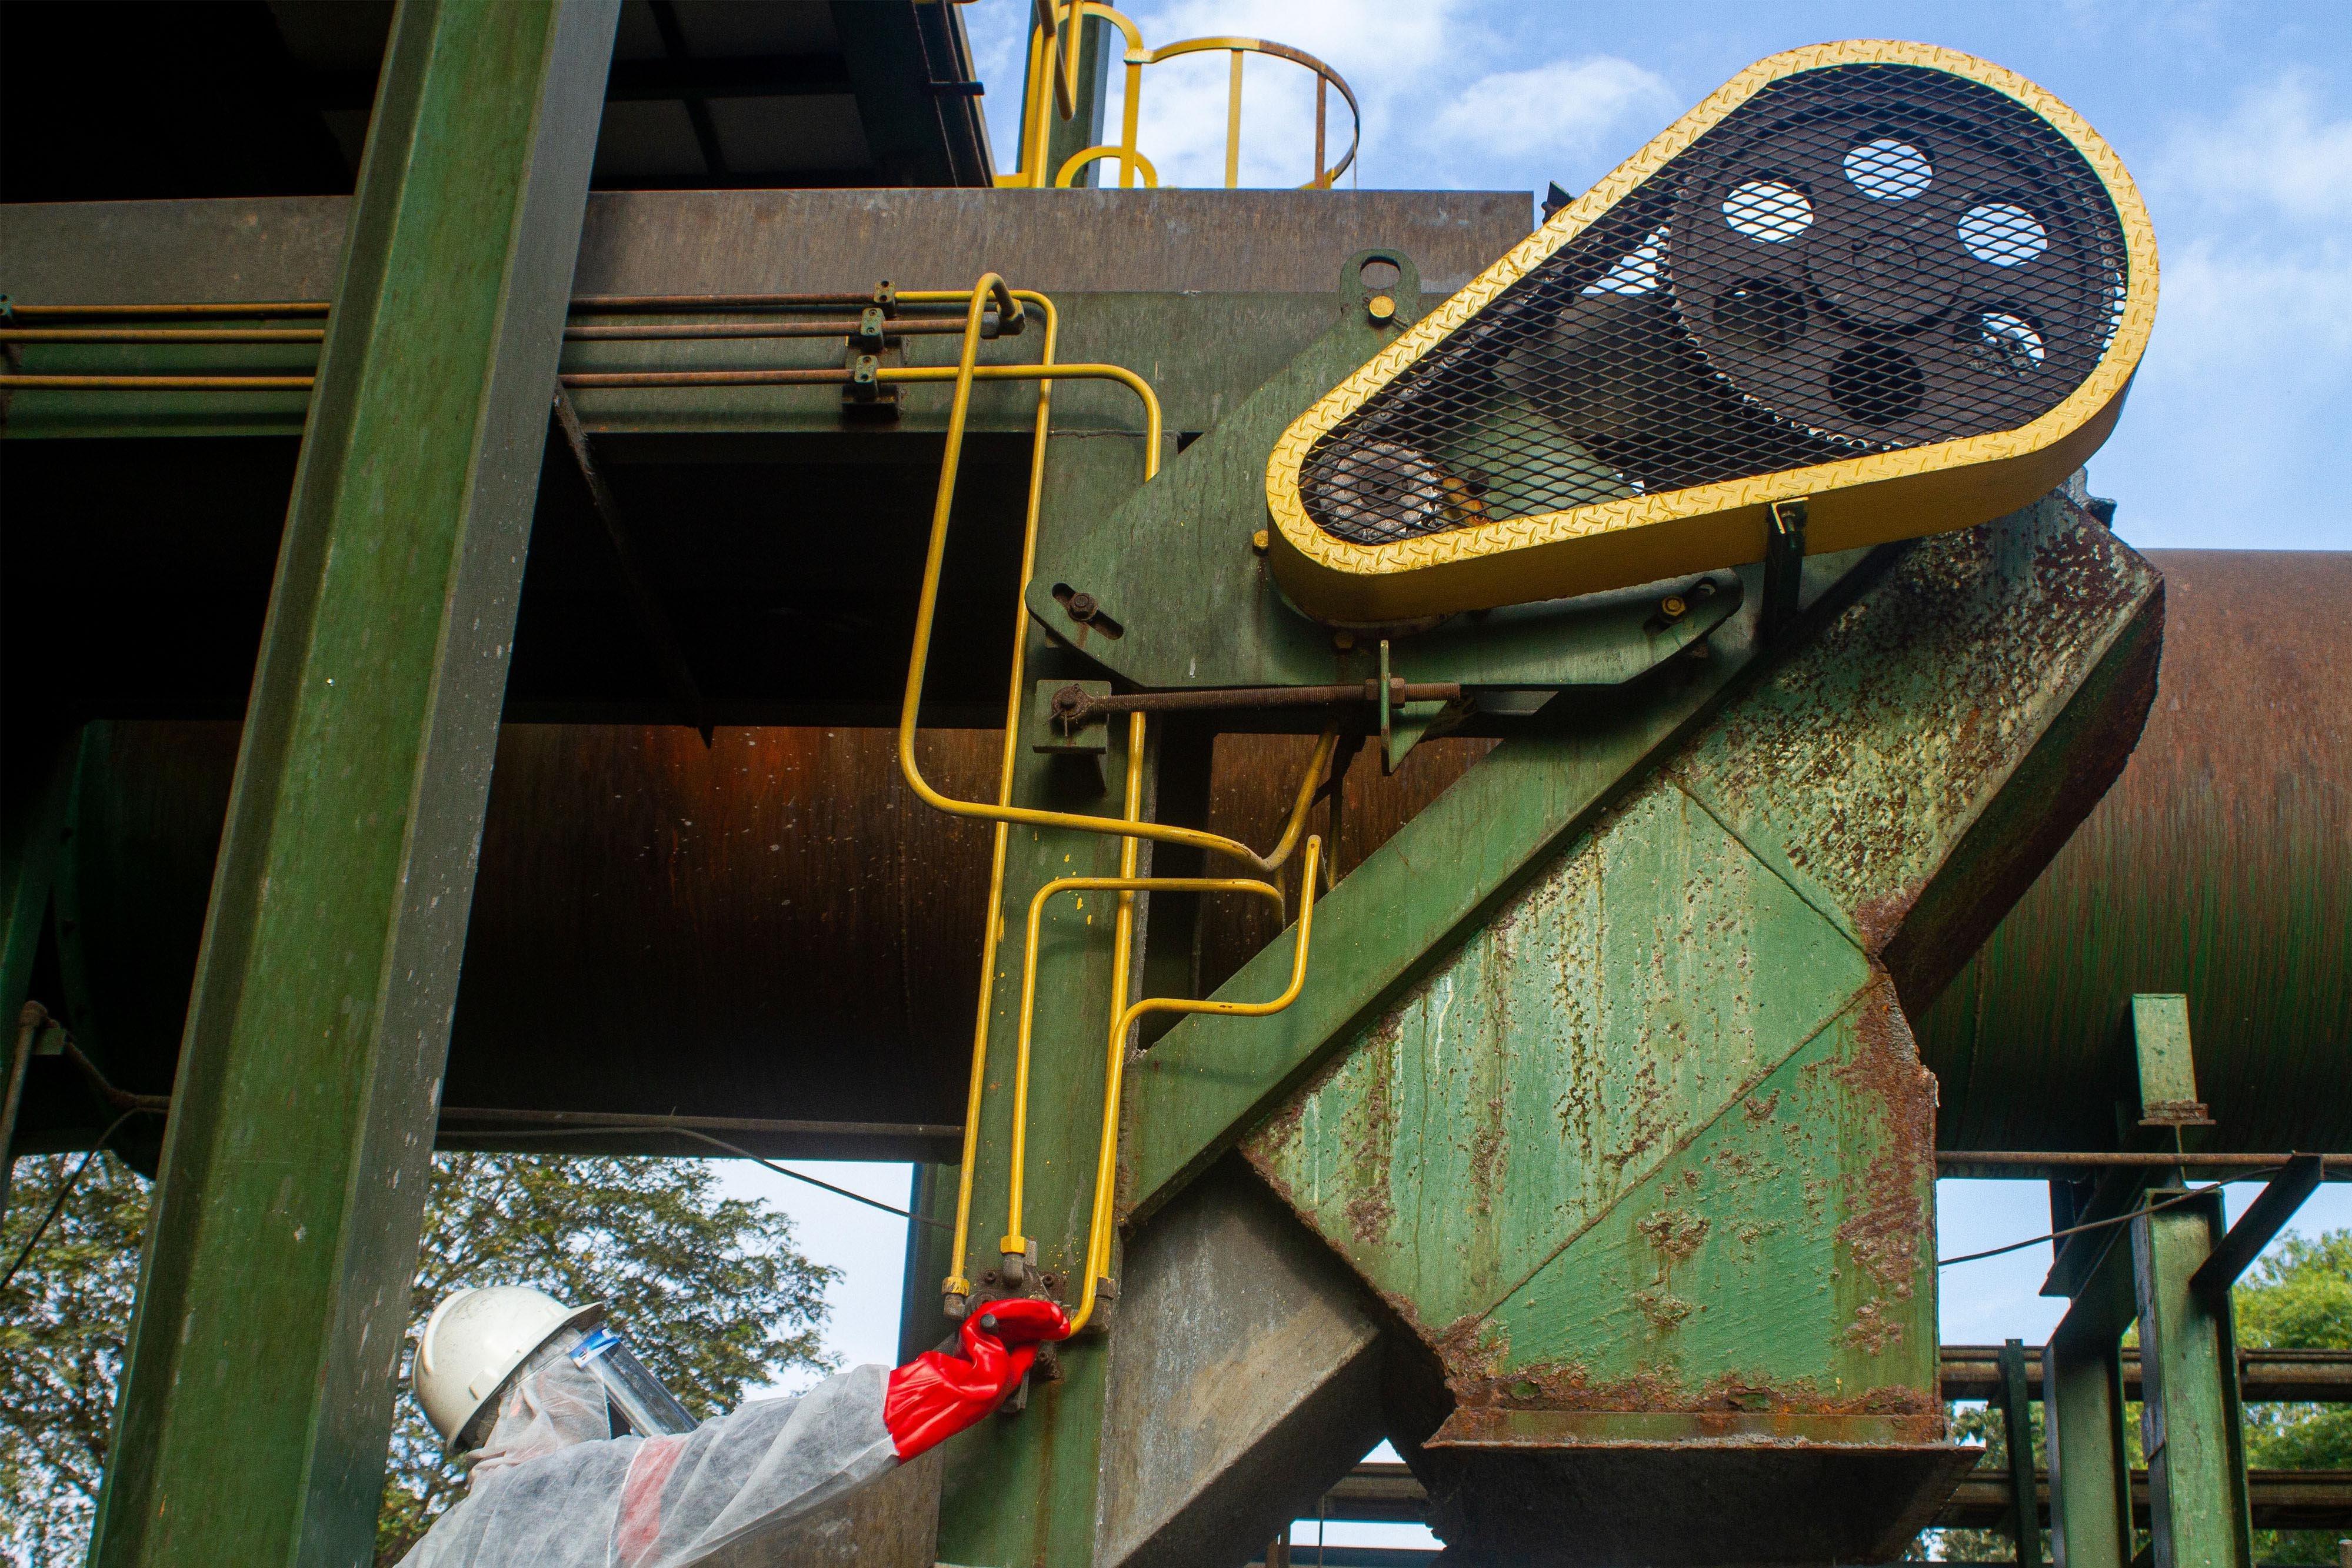 Petugas memeriksa fungsi sistem mesin Incinerator untuk pembakaran limbah infeksius di PT Jasa Medivest, Plant Dawuan, Karawang, Jawa Barat.